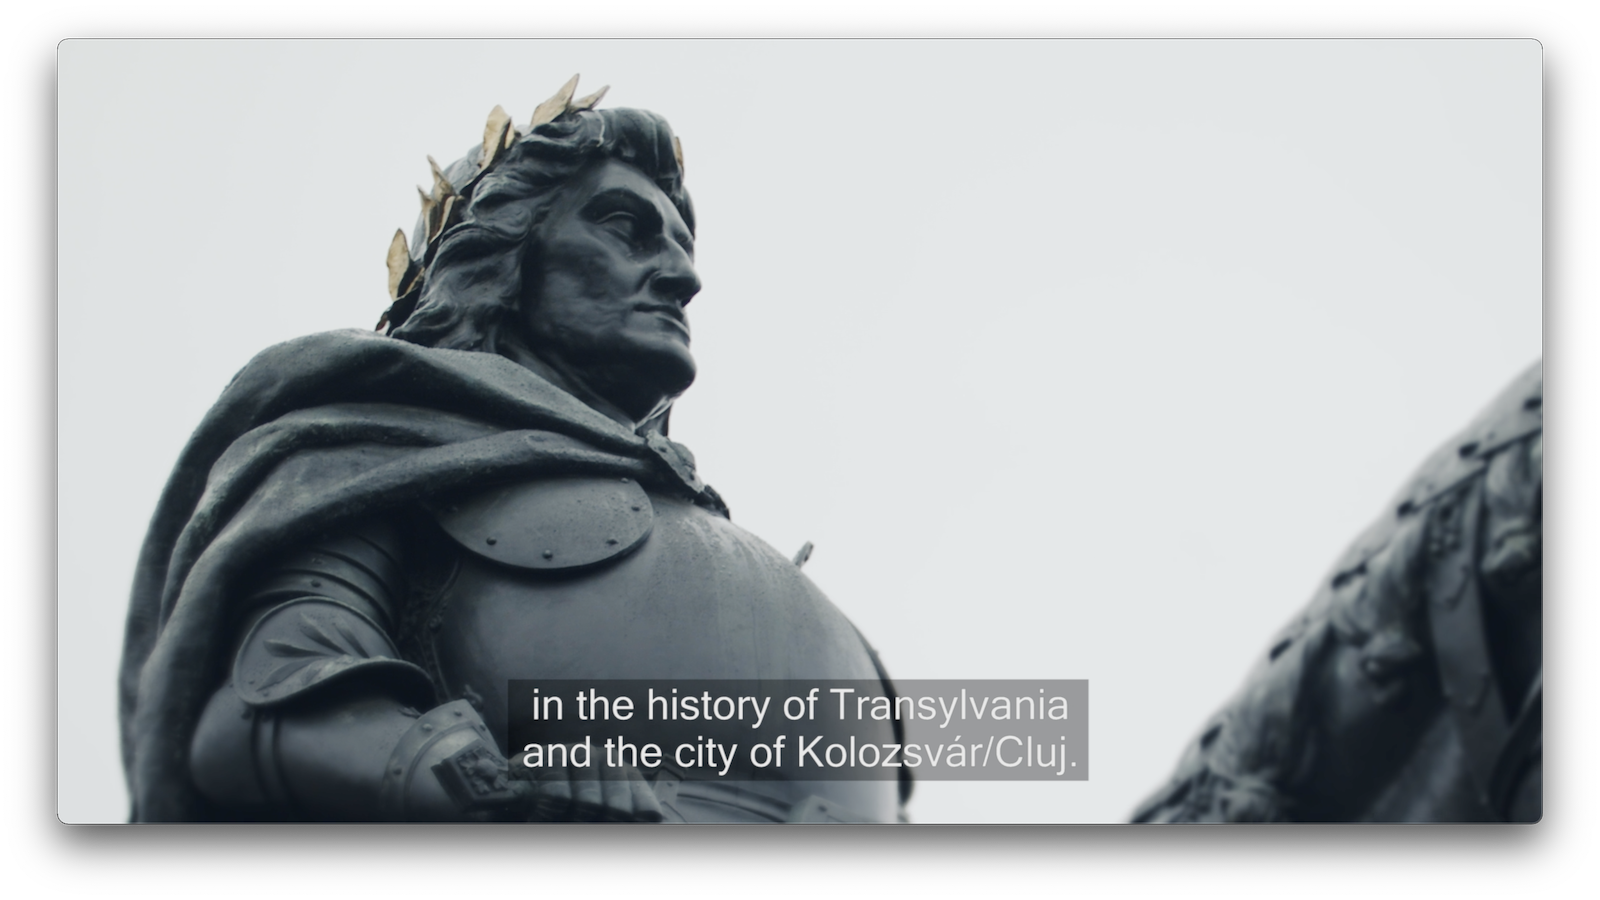 The King Matthias Corvinus Statue